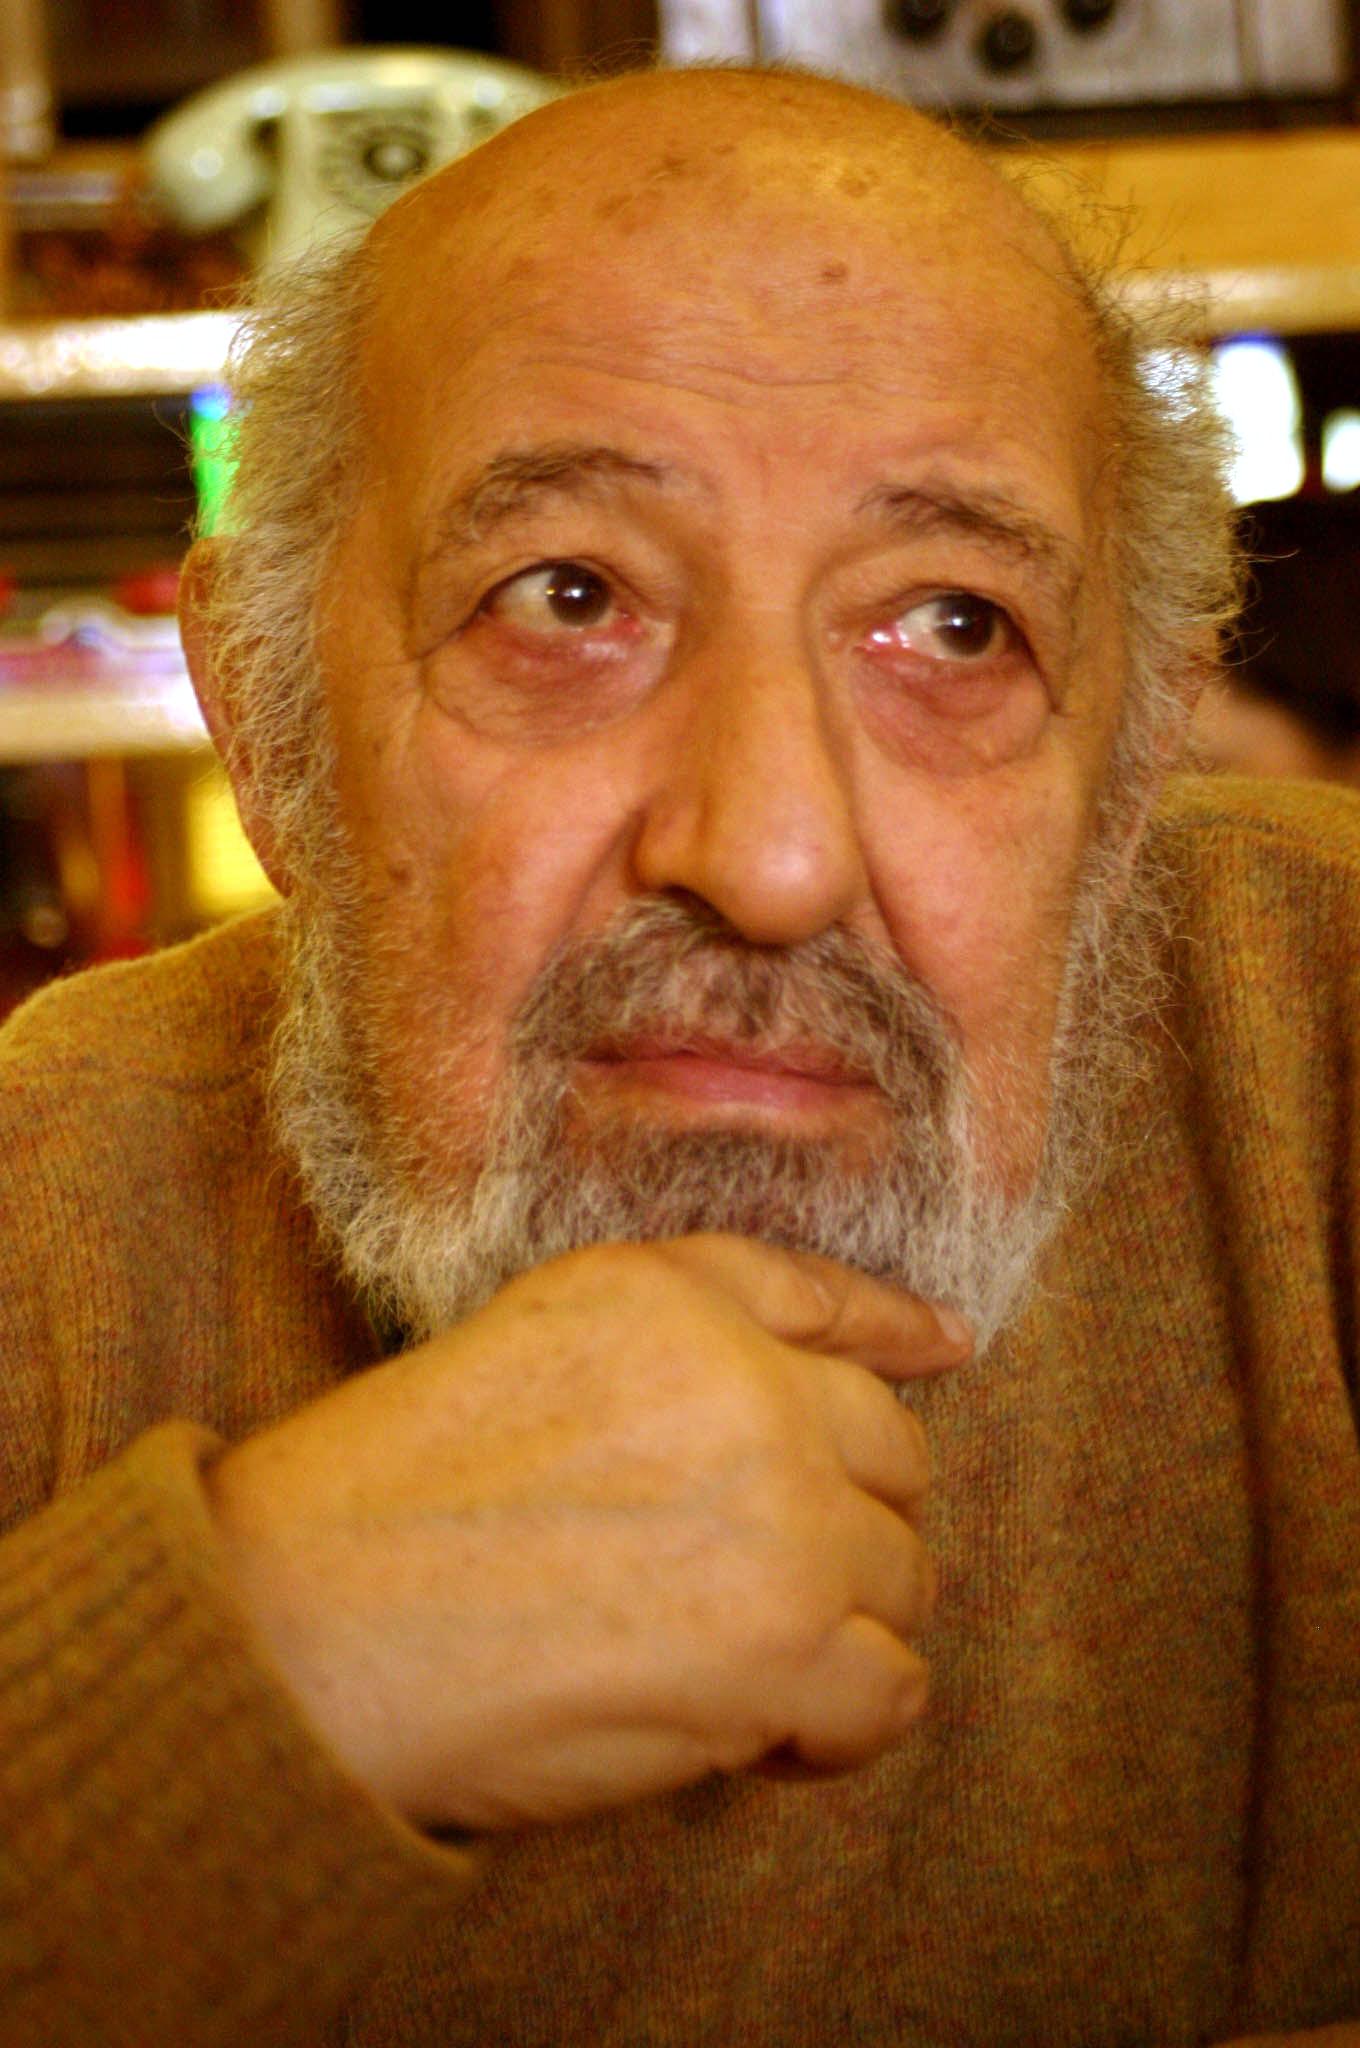 Image of Ara Güler from Wikidata